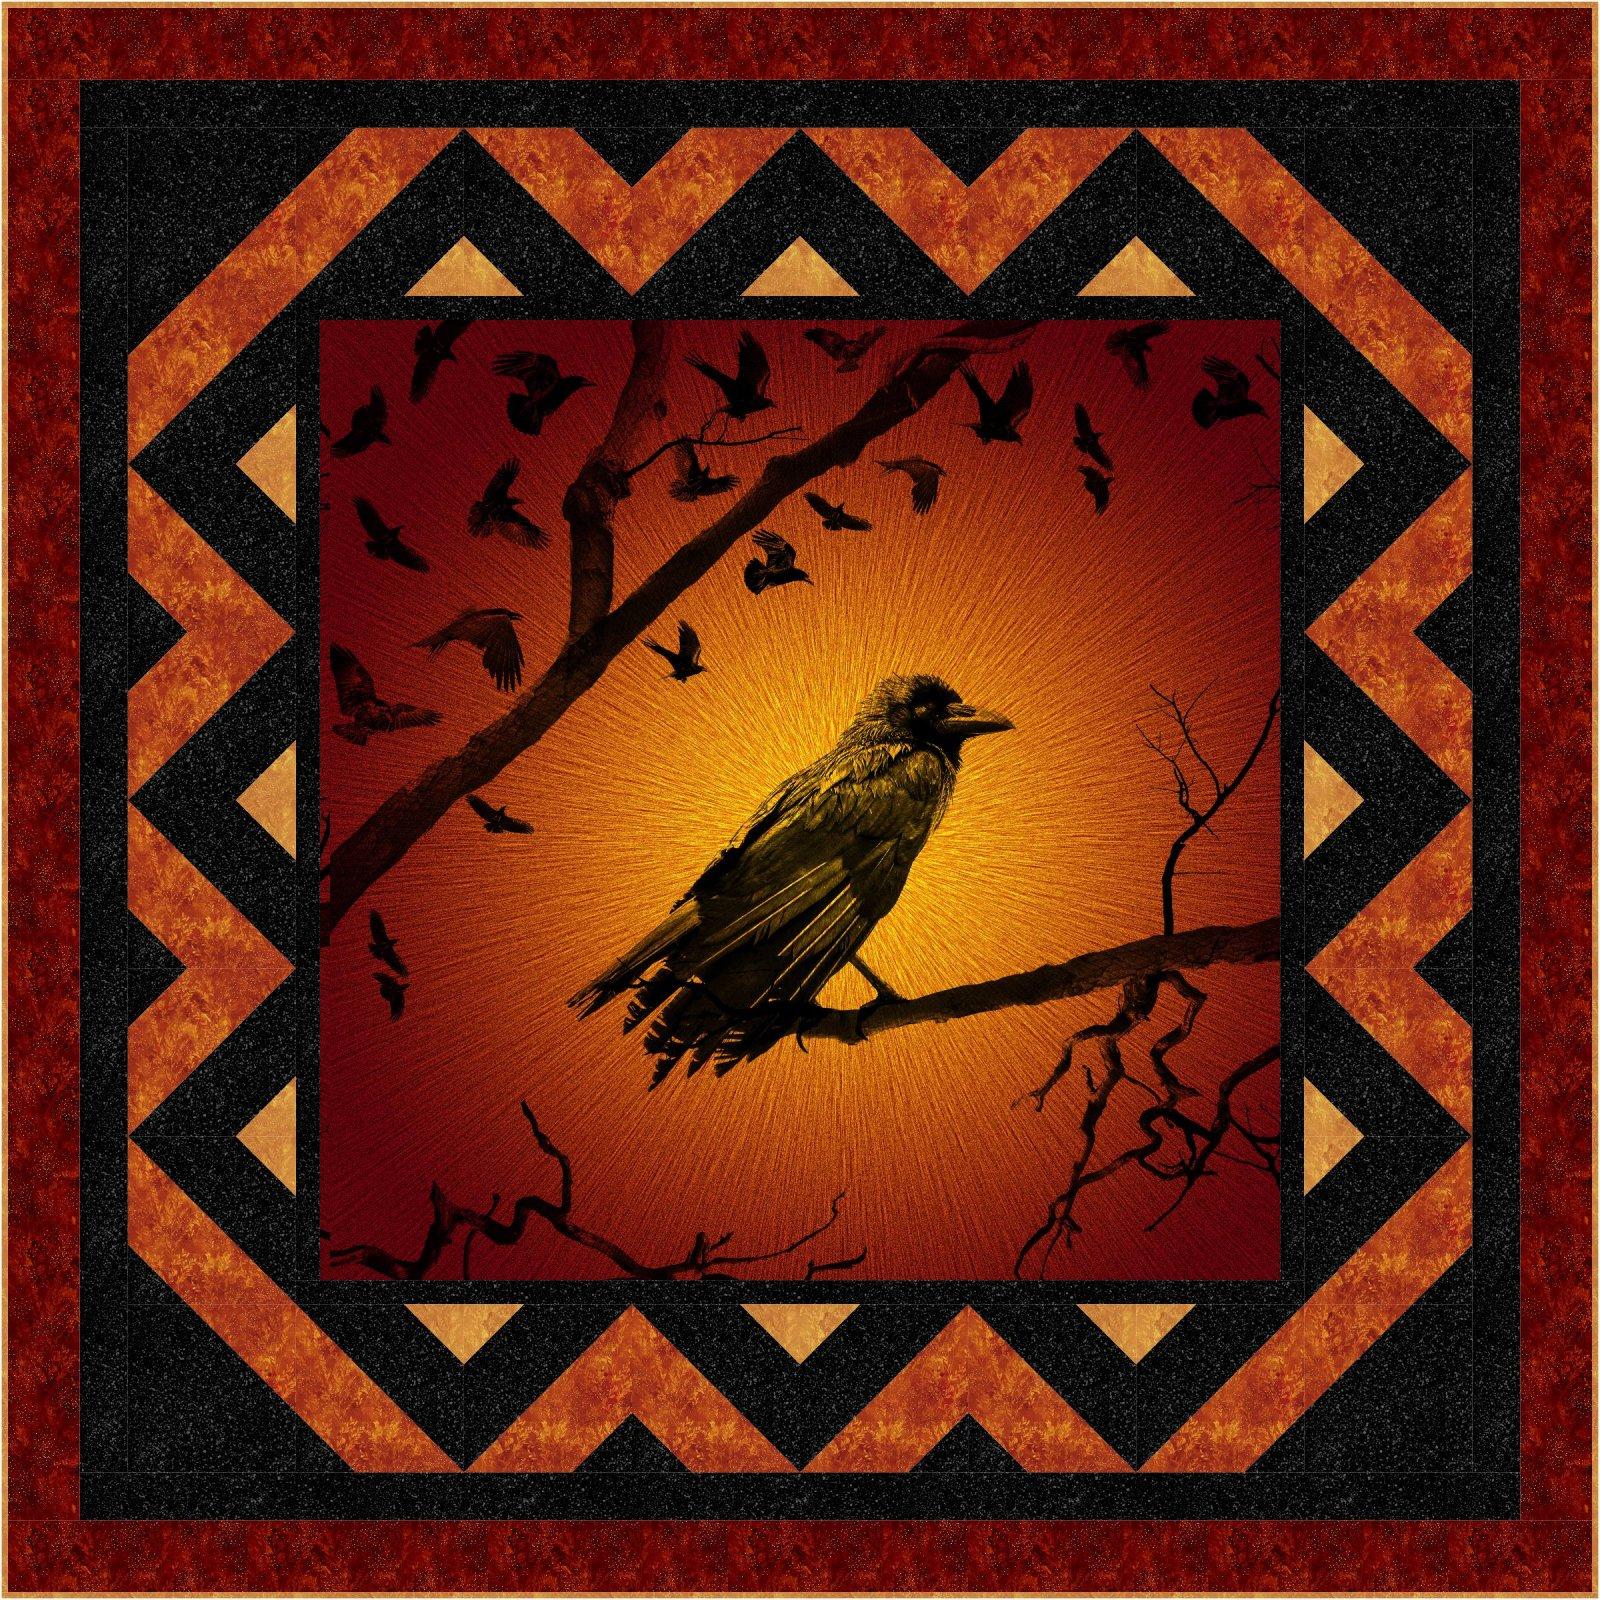 Haunted Blackbird